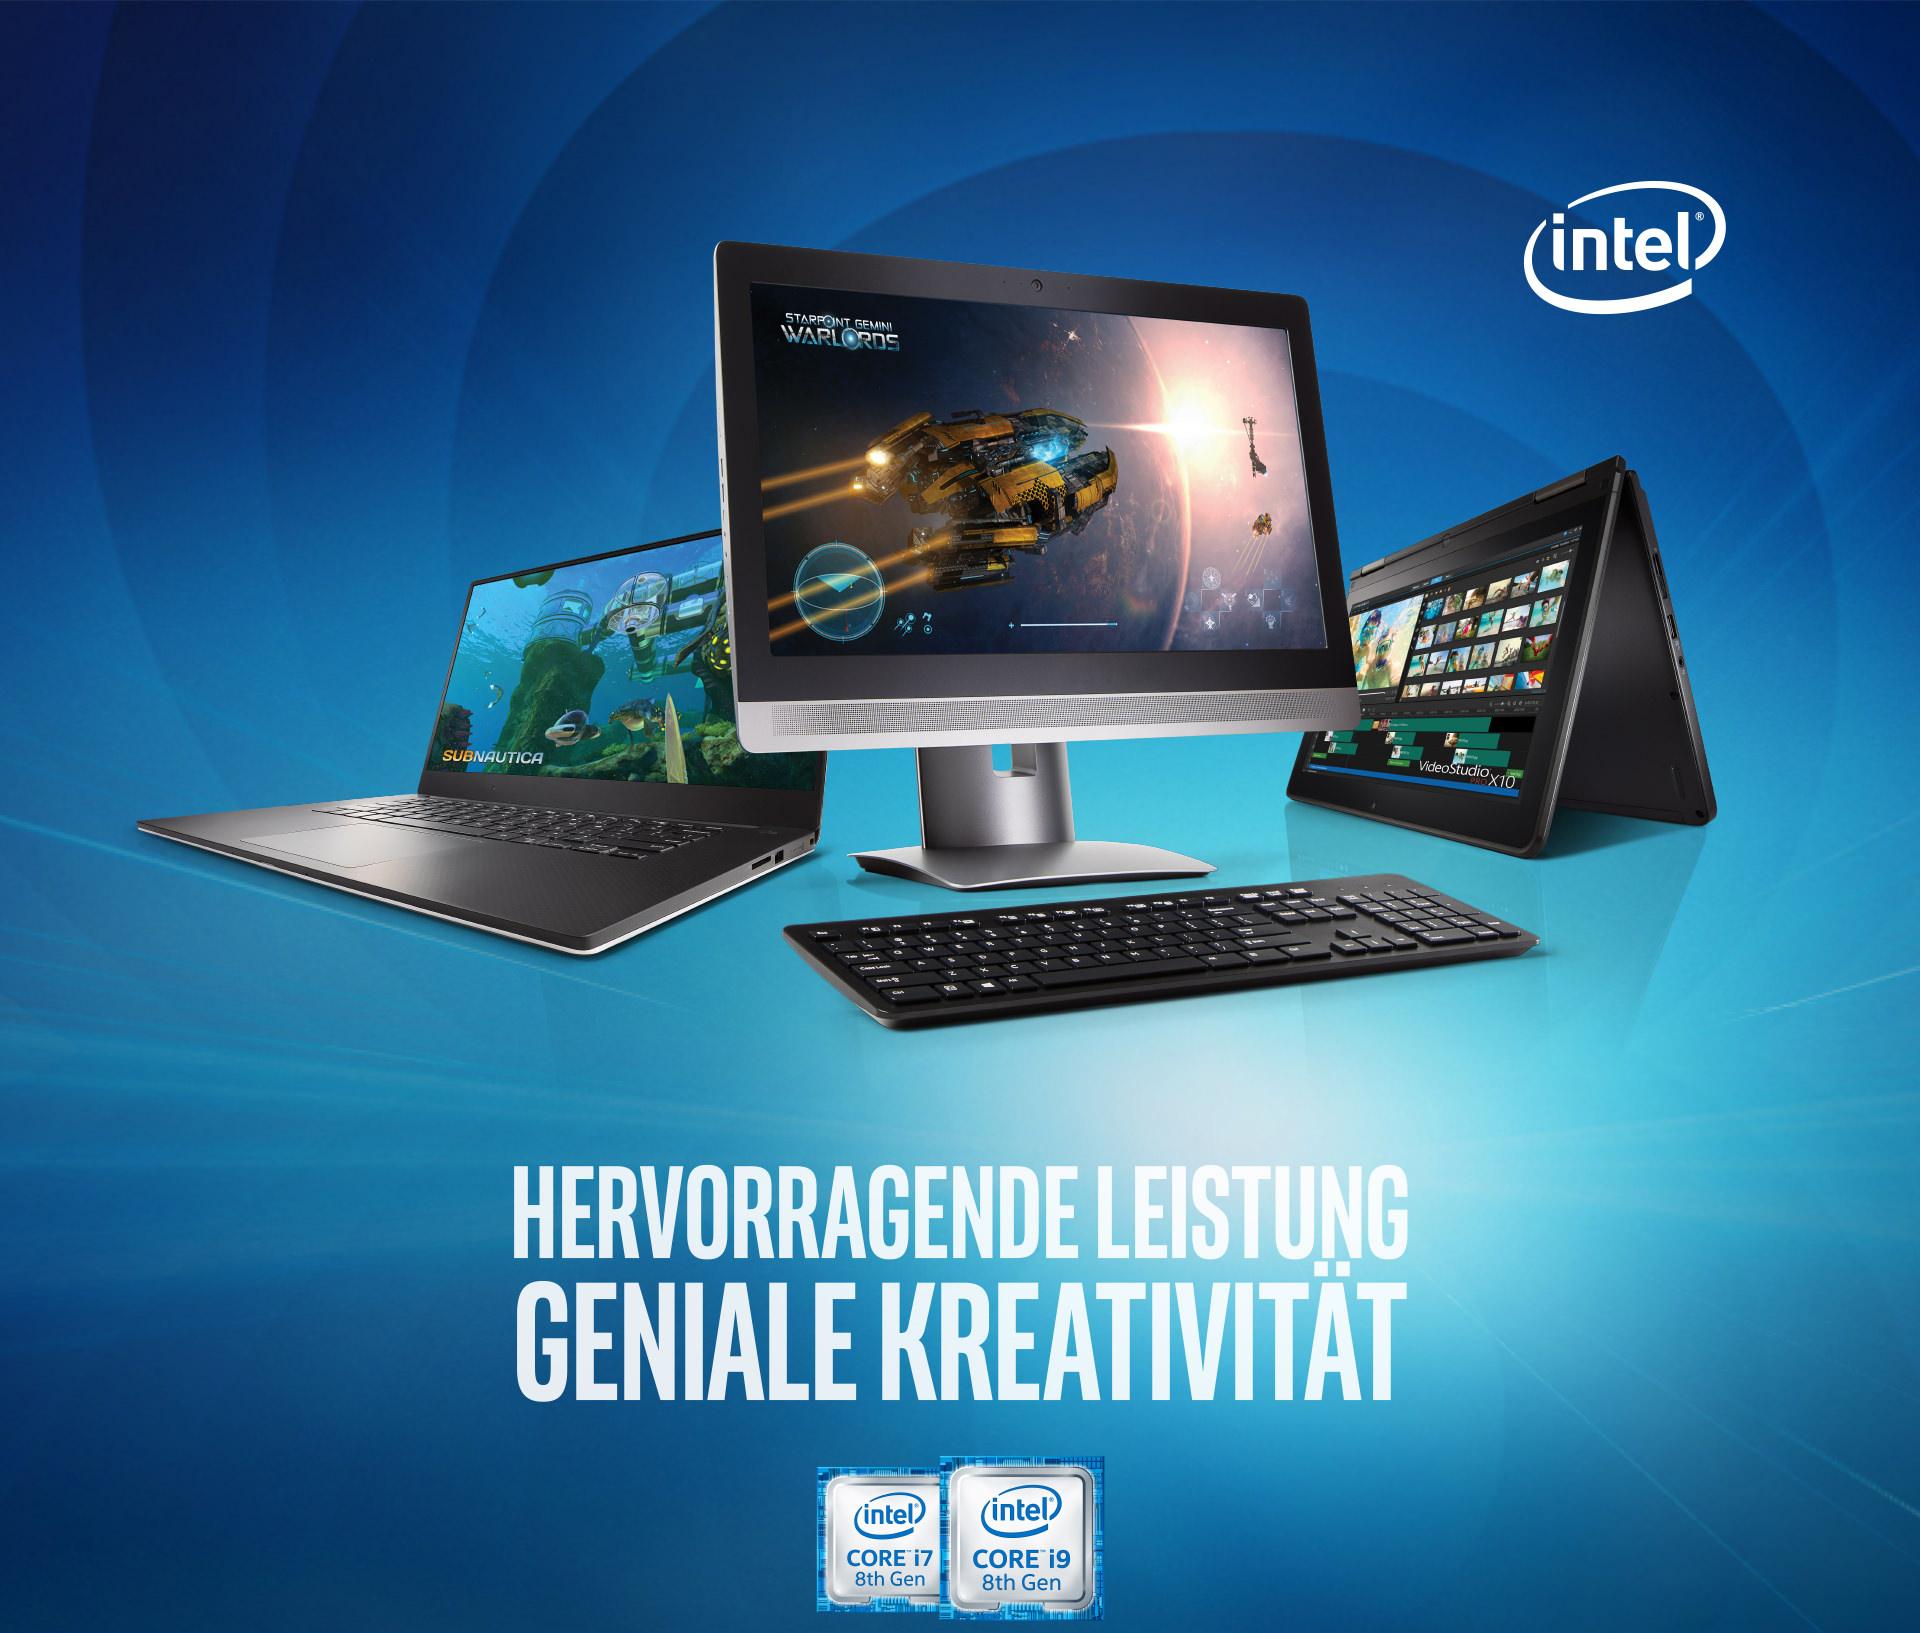 Intel® Hervorragende Leistung Geniale Kreativität - Intel® Core™ i7 & i9 CPU